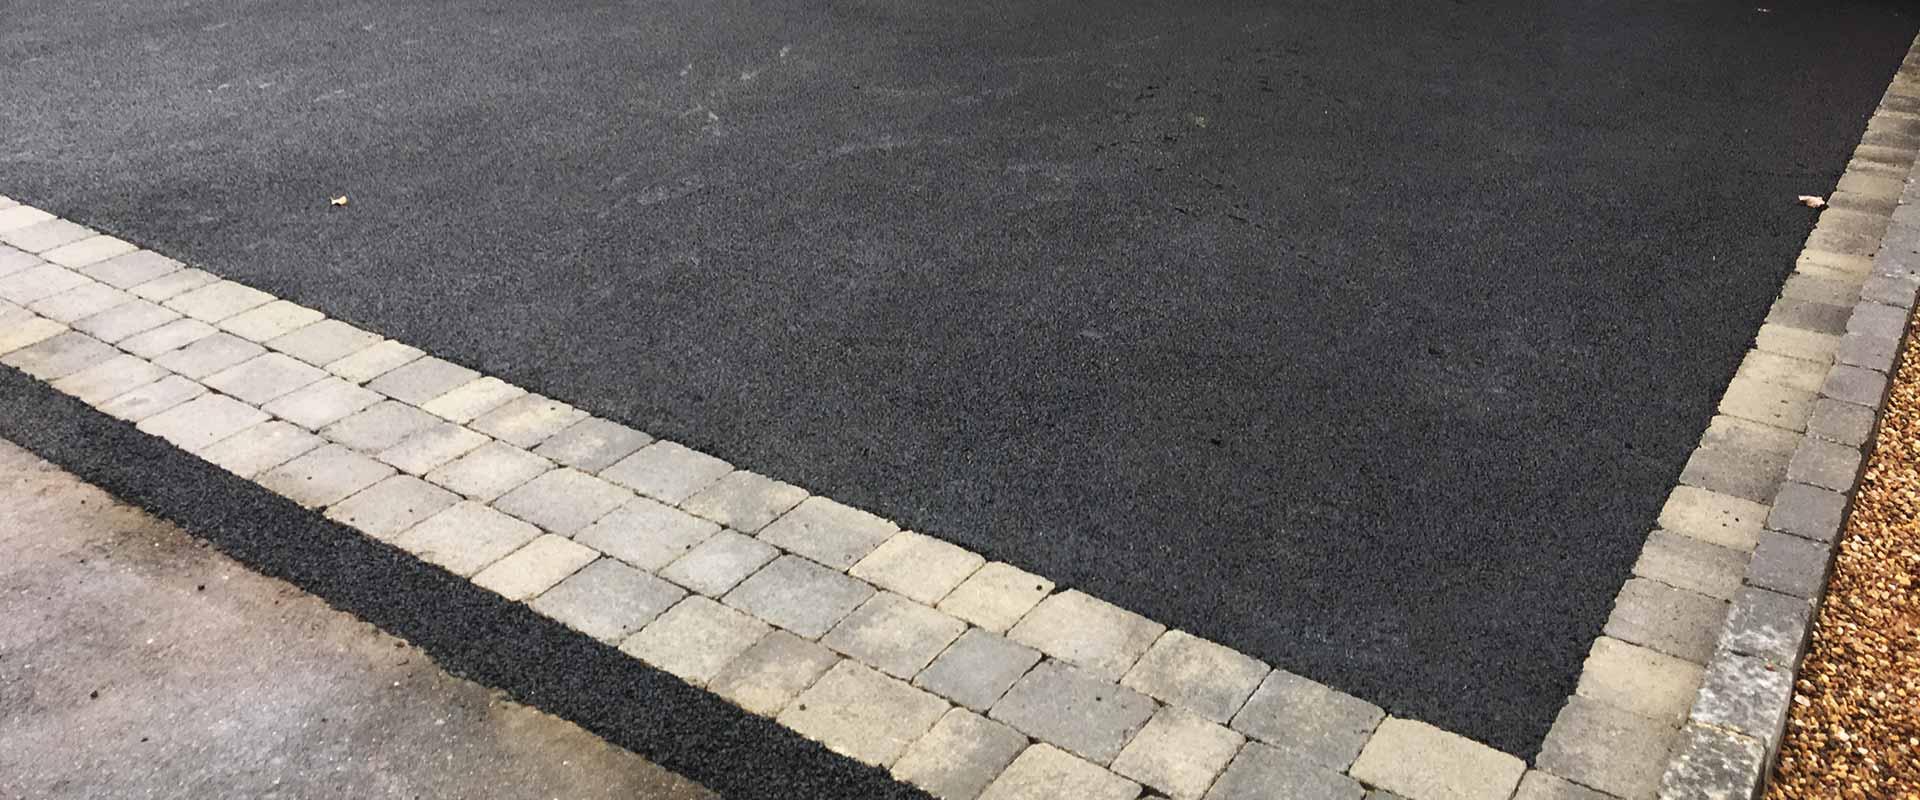 Driveway Installers Solihull